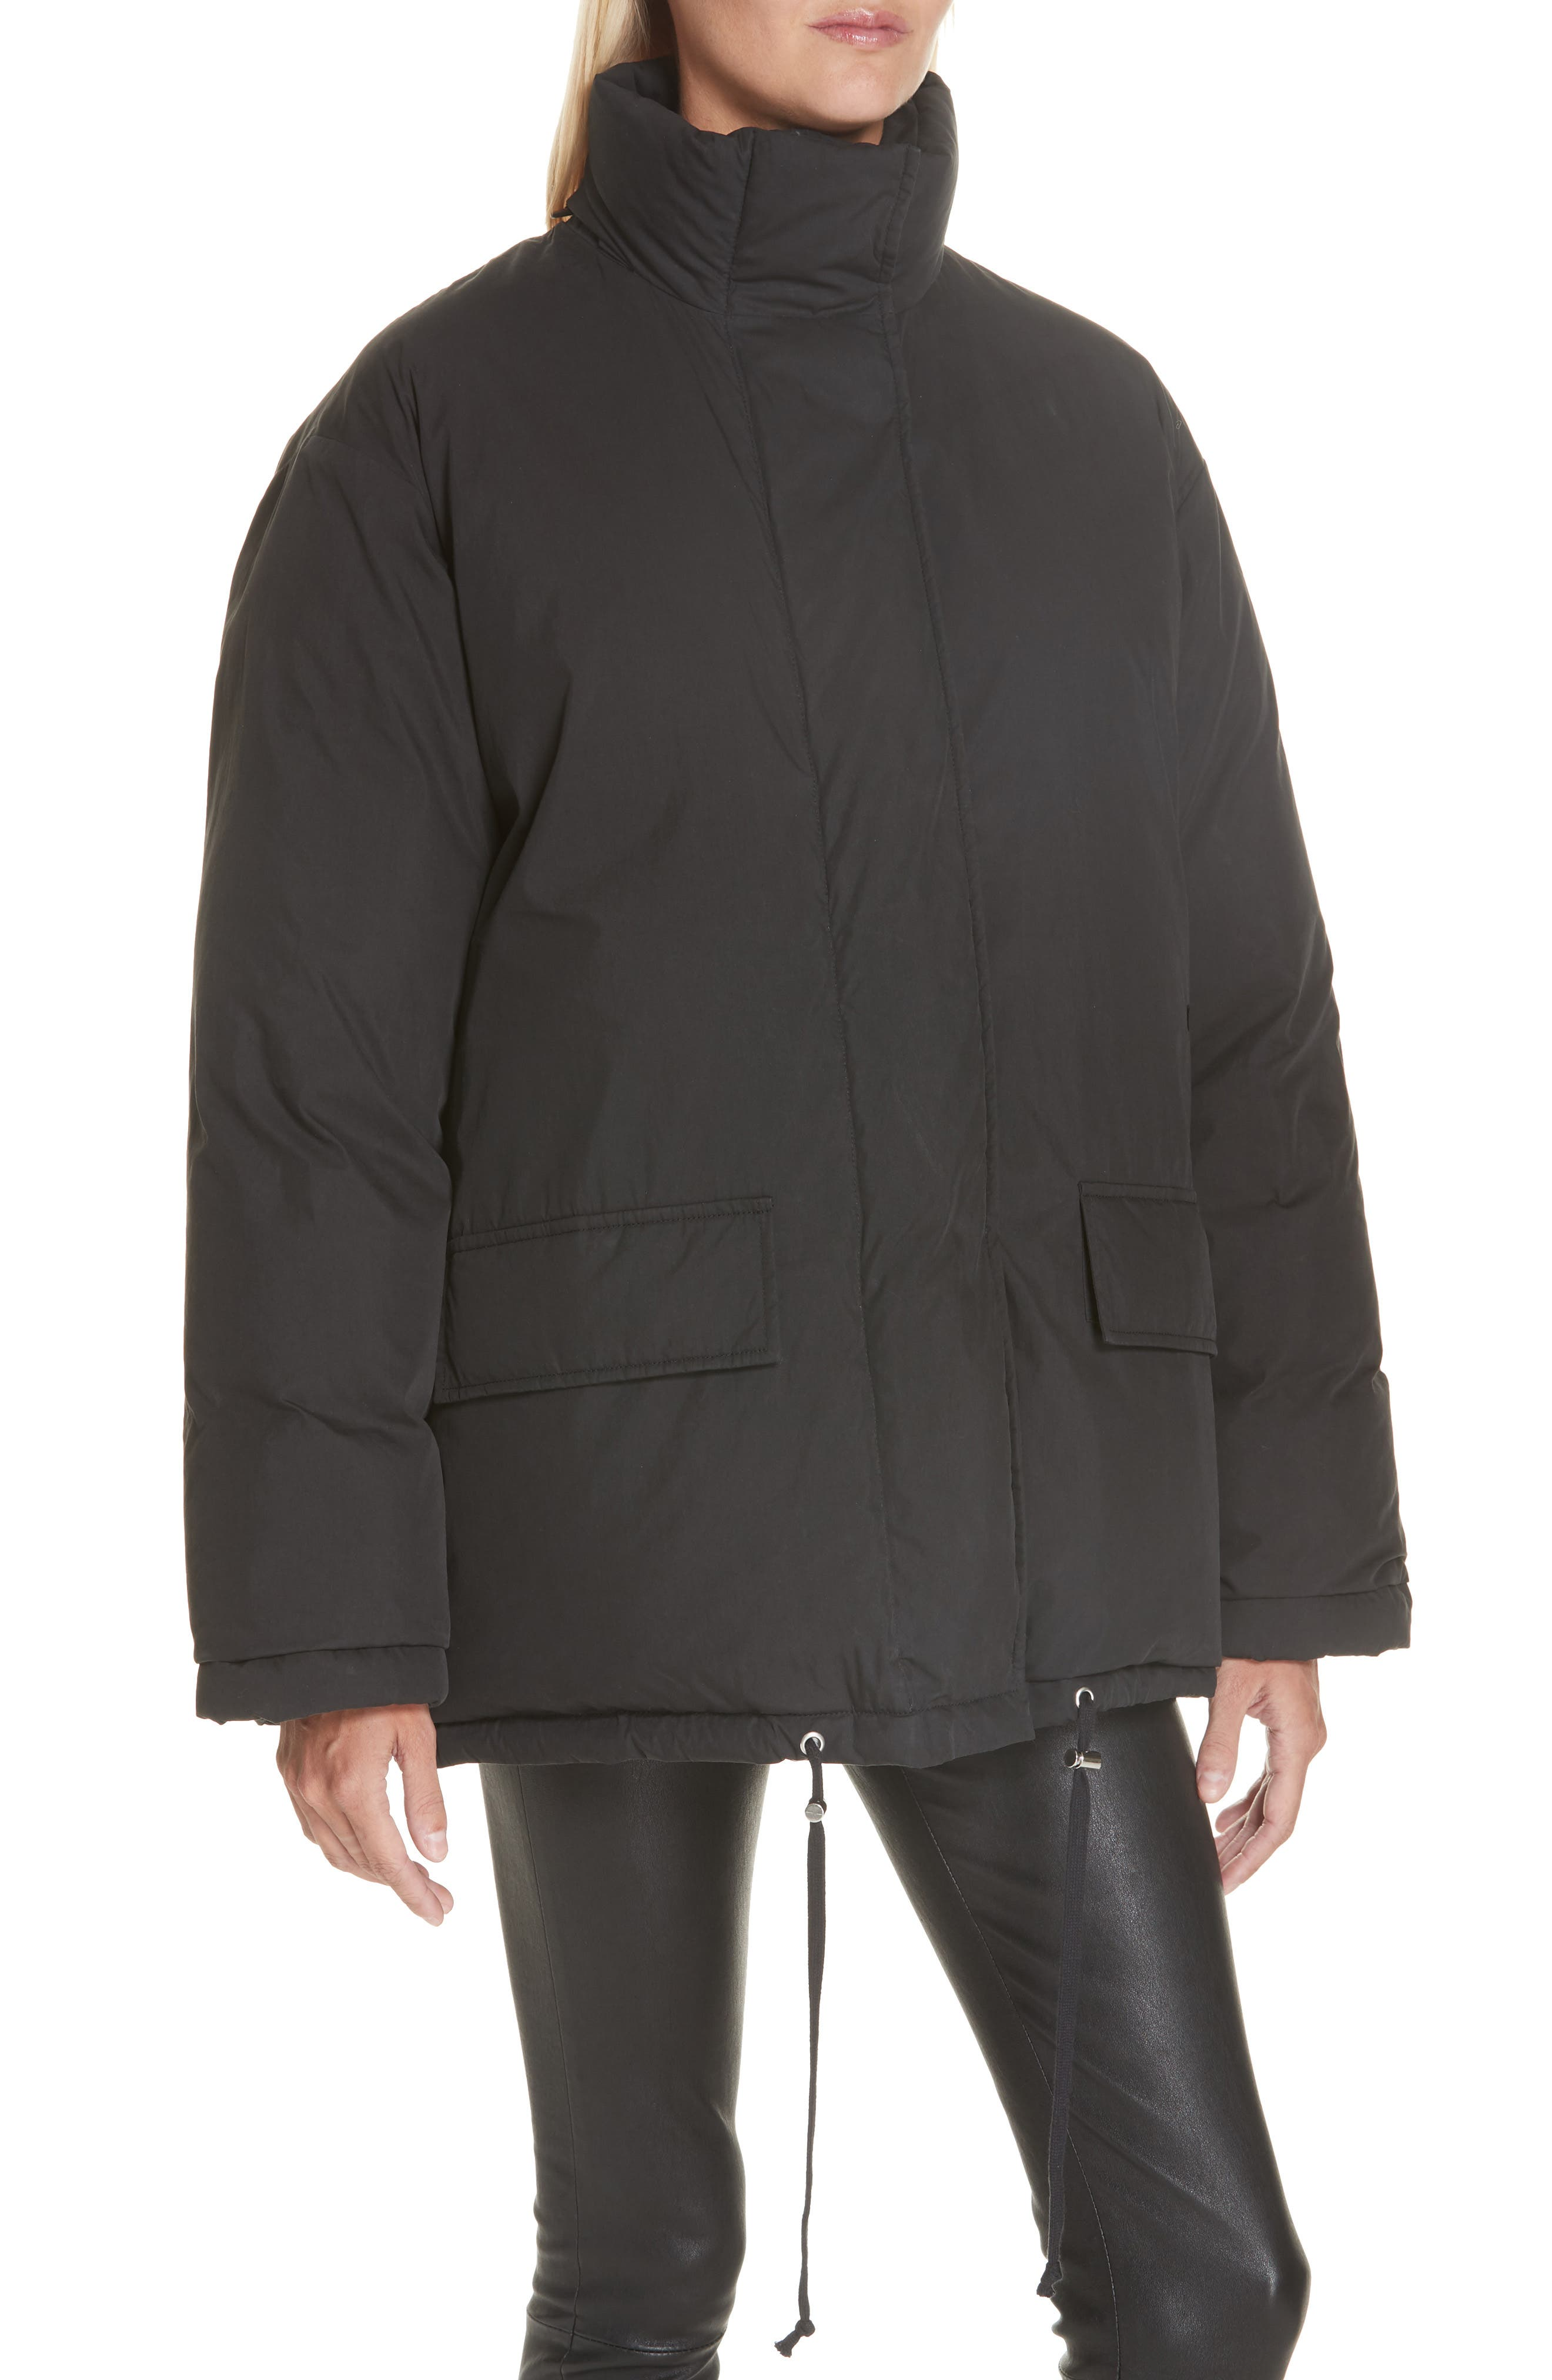 HELMUT LANG, Removable Hood Puffer Jacket, Alternate thumbnail 2, color, 001